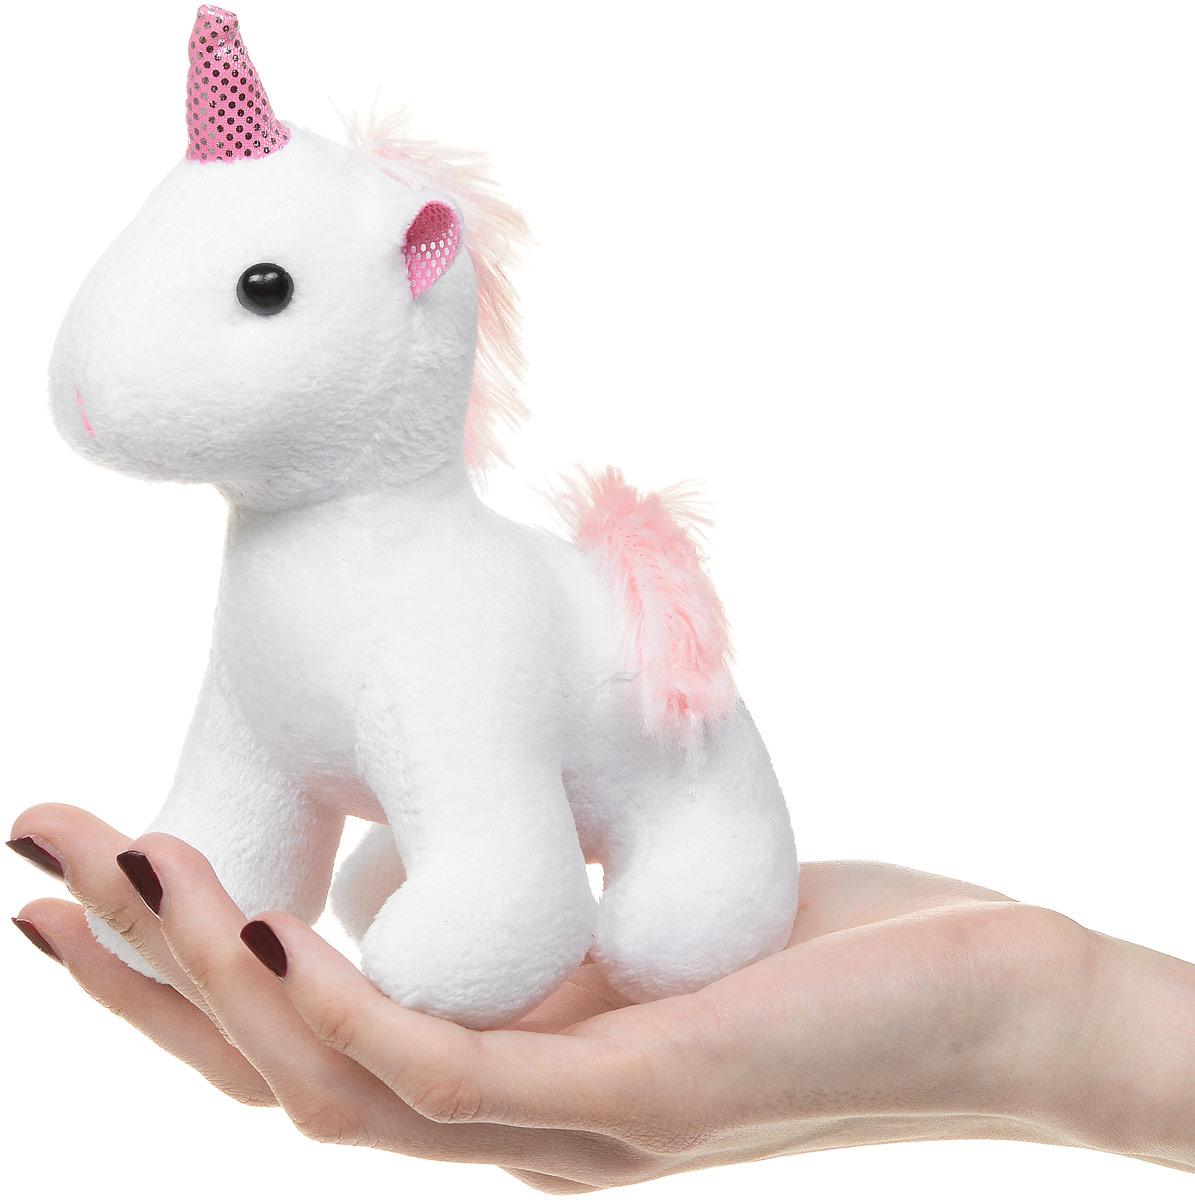 ABtoysМягкая игрушка Единорог цвет белый 12 см ABtoys